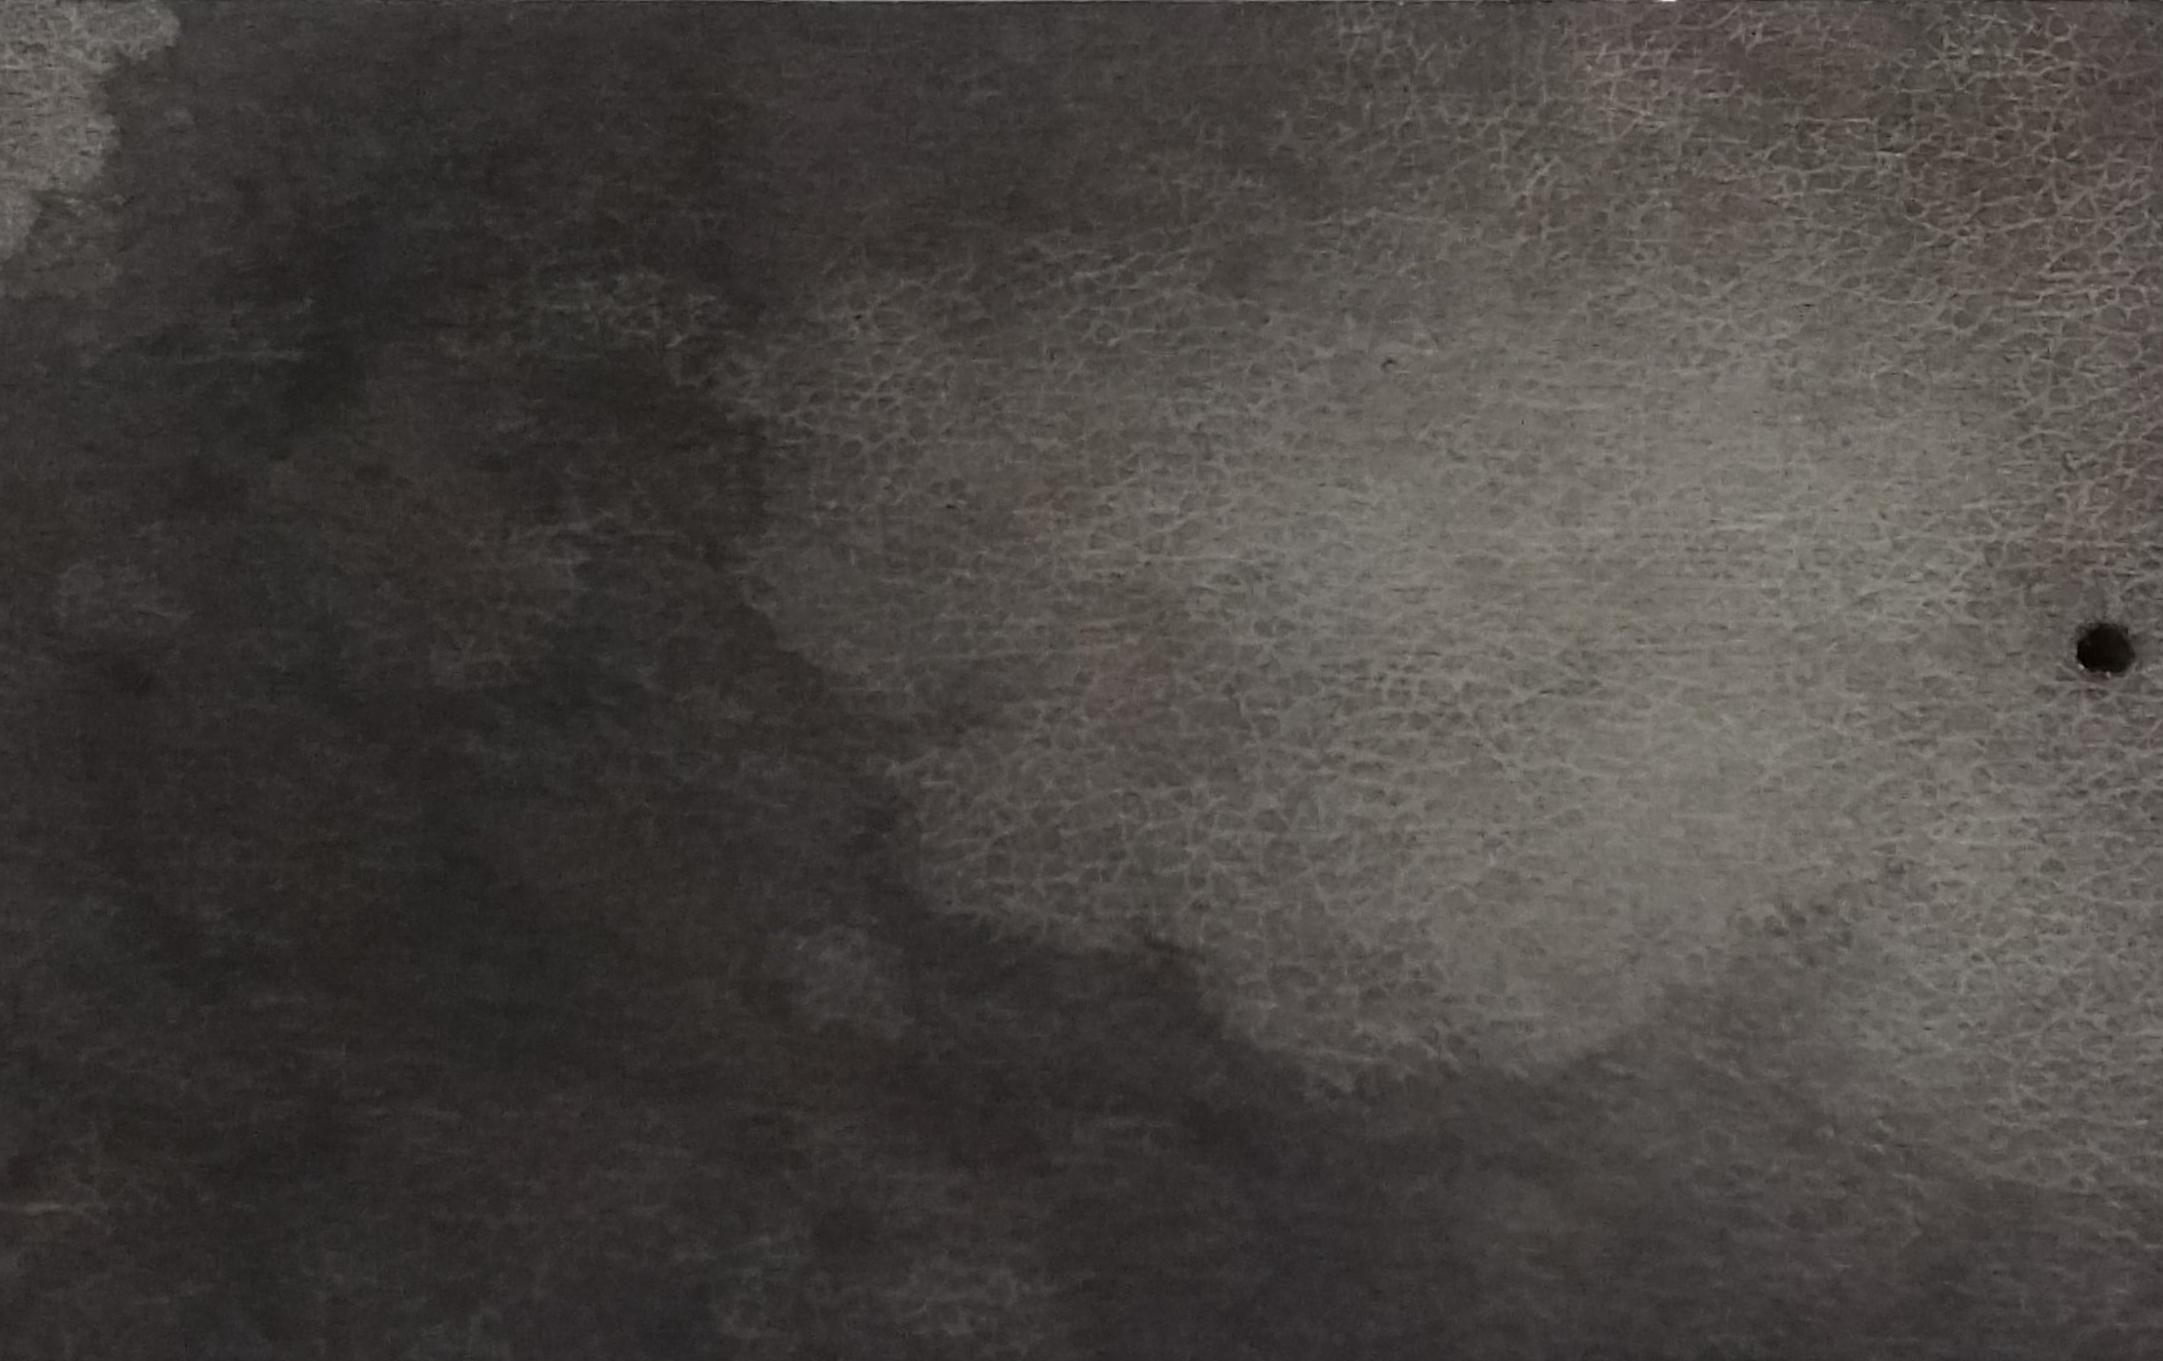 Charcoal Vellum